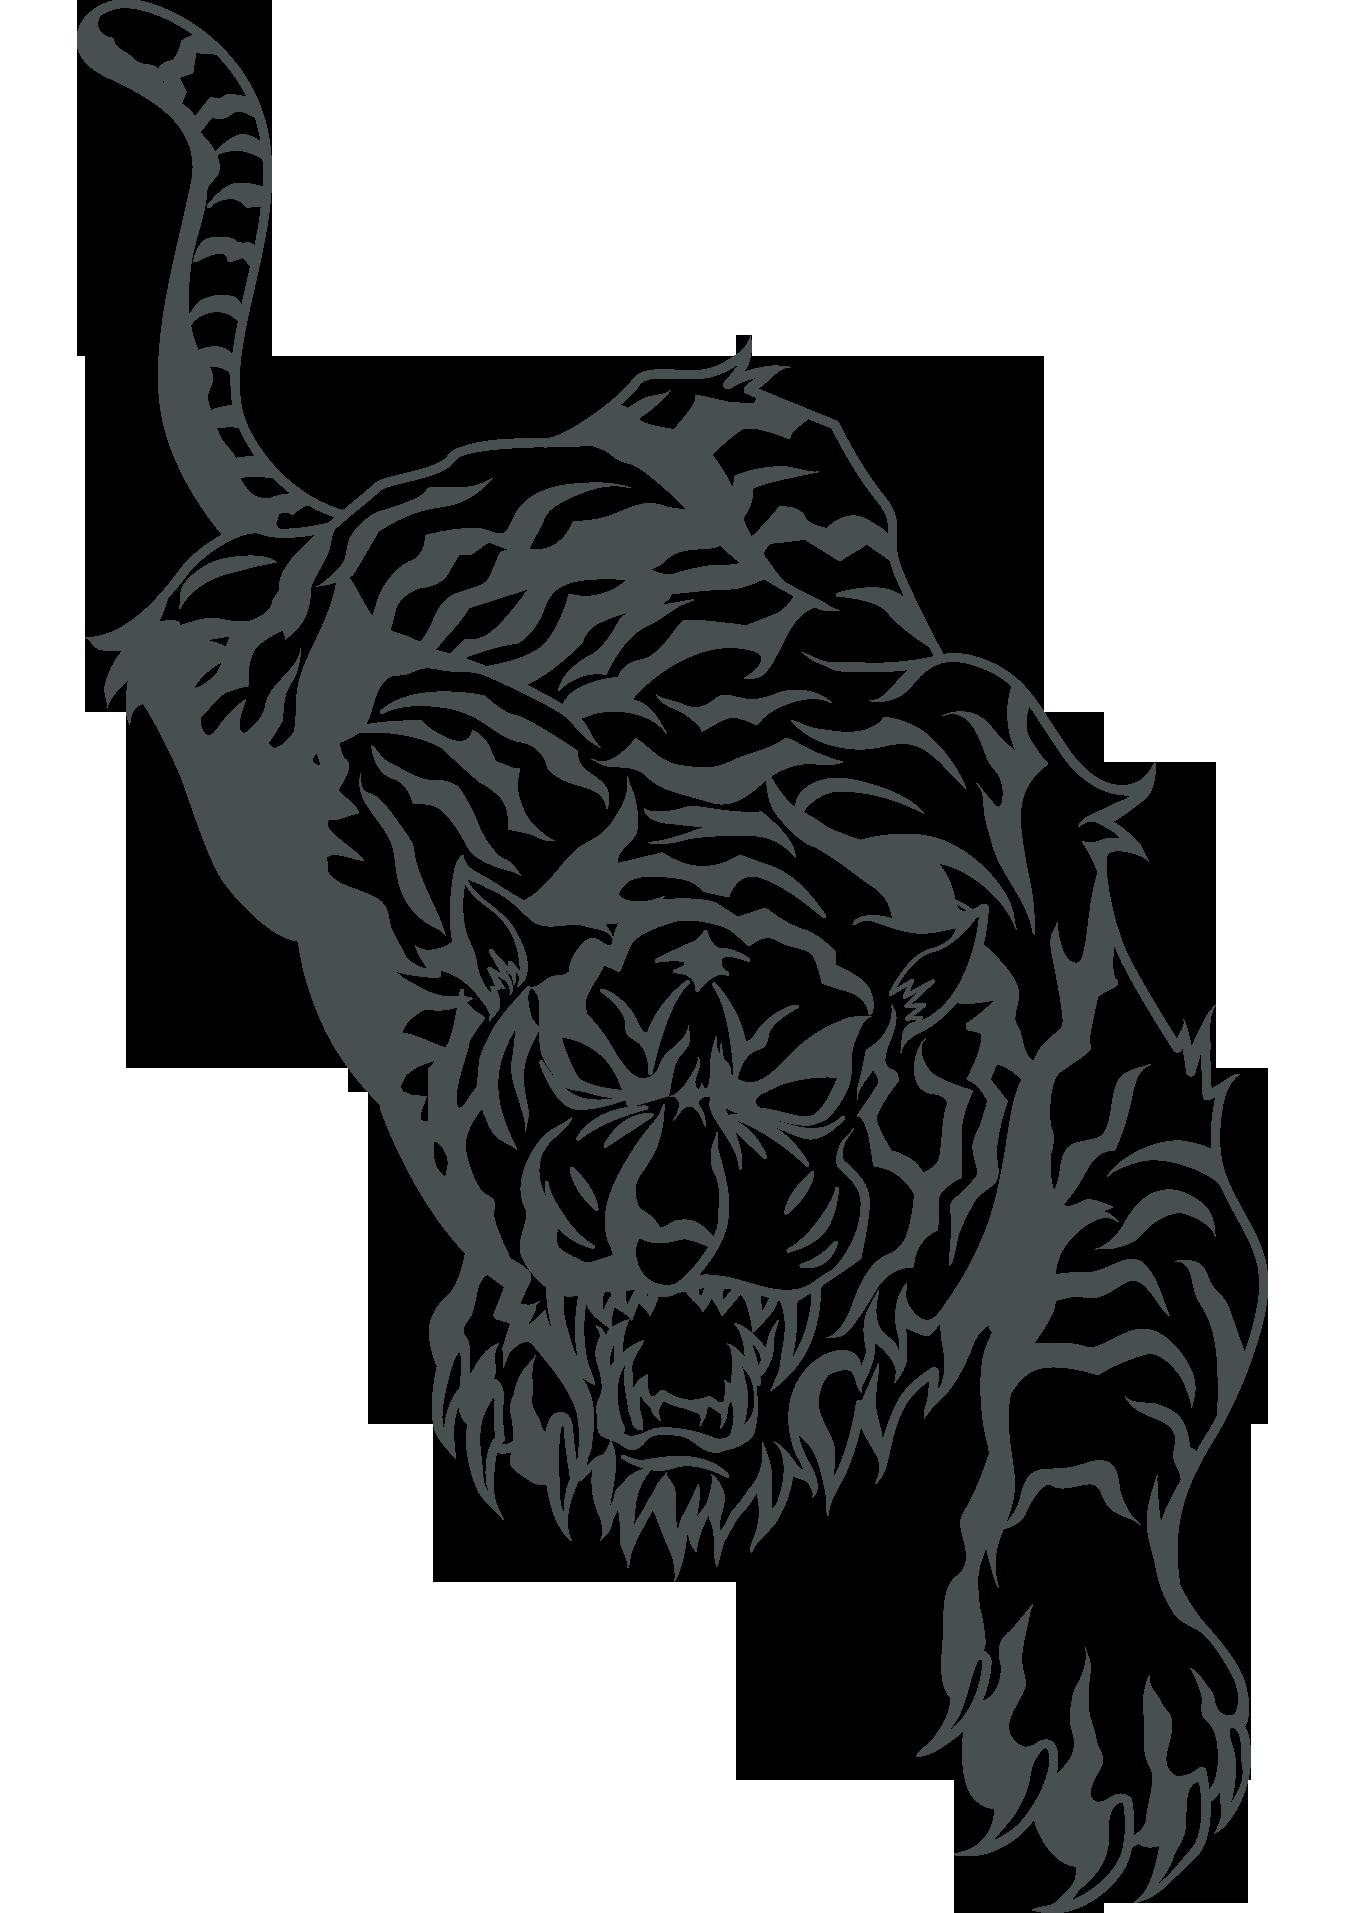 Tattoo flash clip art. Clipart tiger black and white